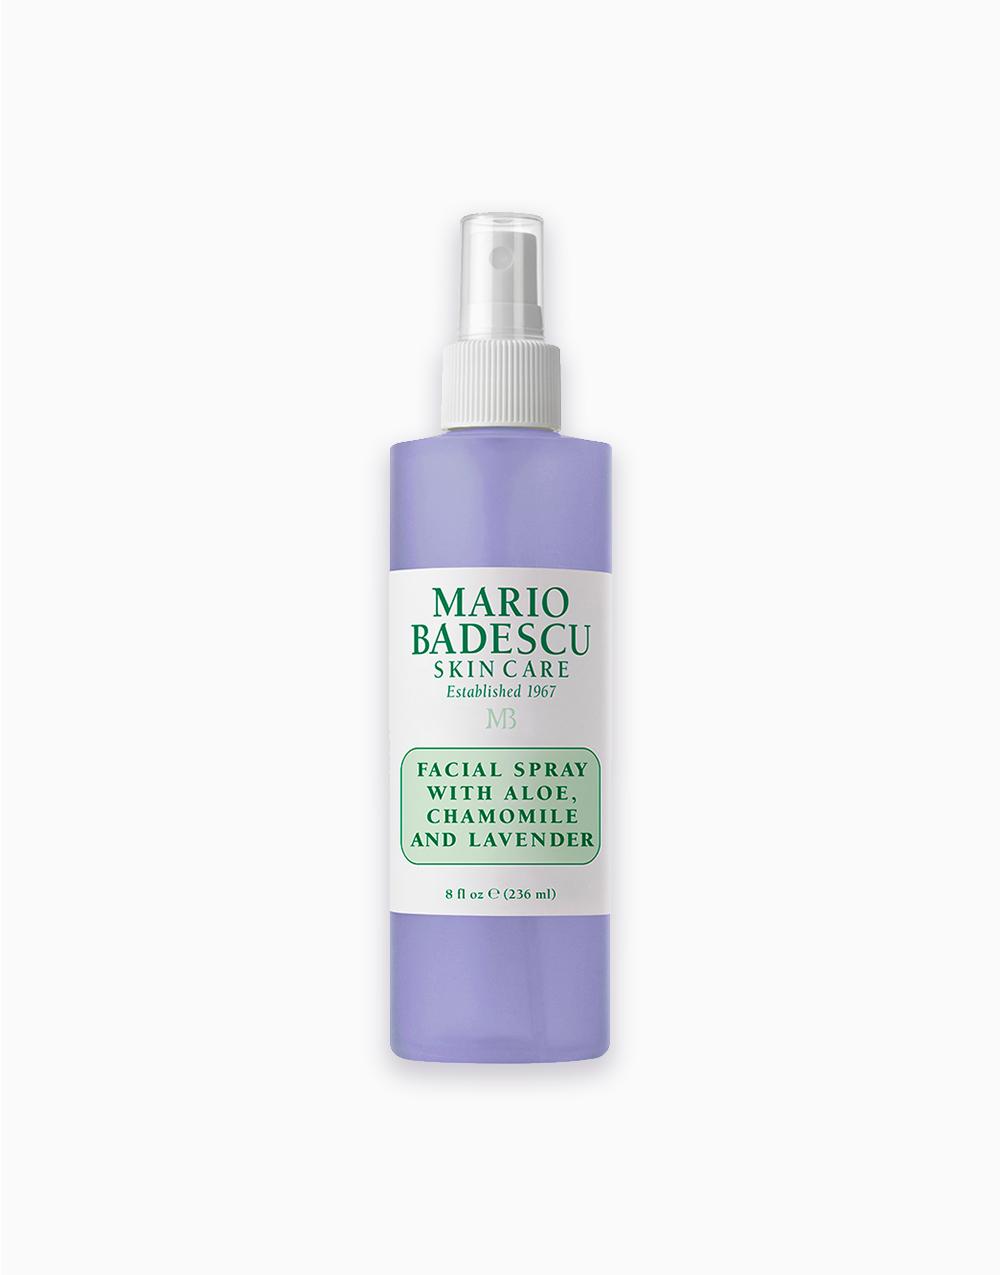 Facial Spray with Aloe, Chamomile and Lavender (8oz) by Mario Badescu